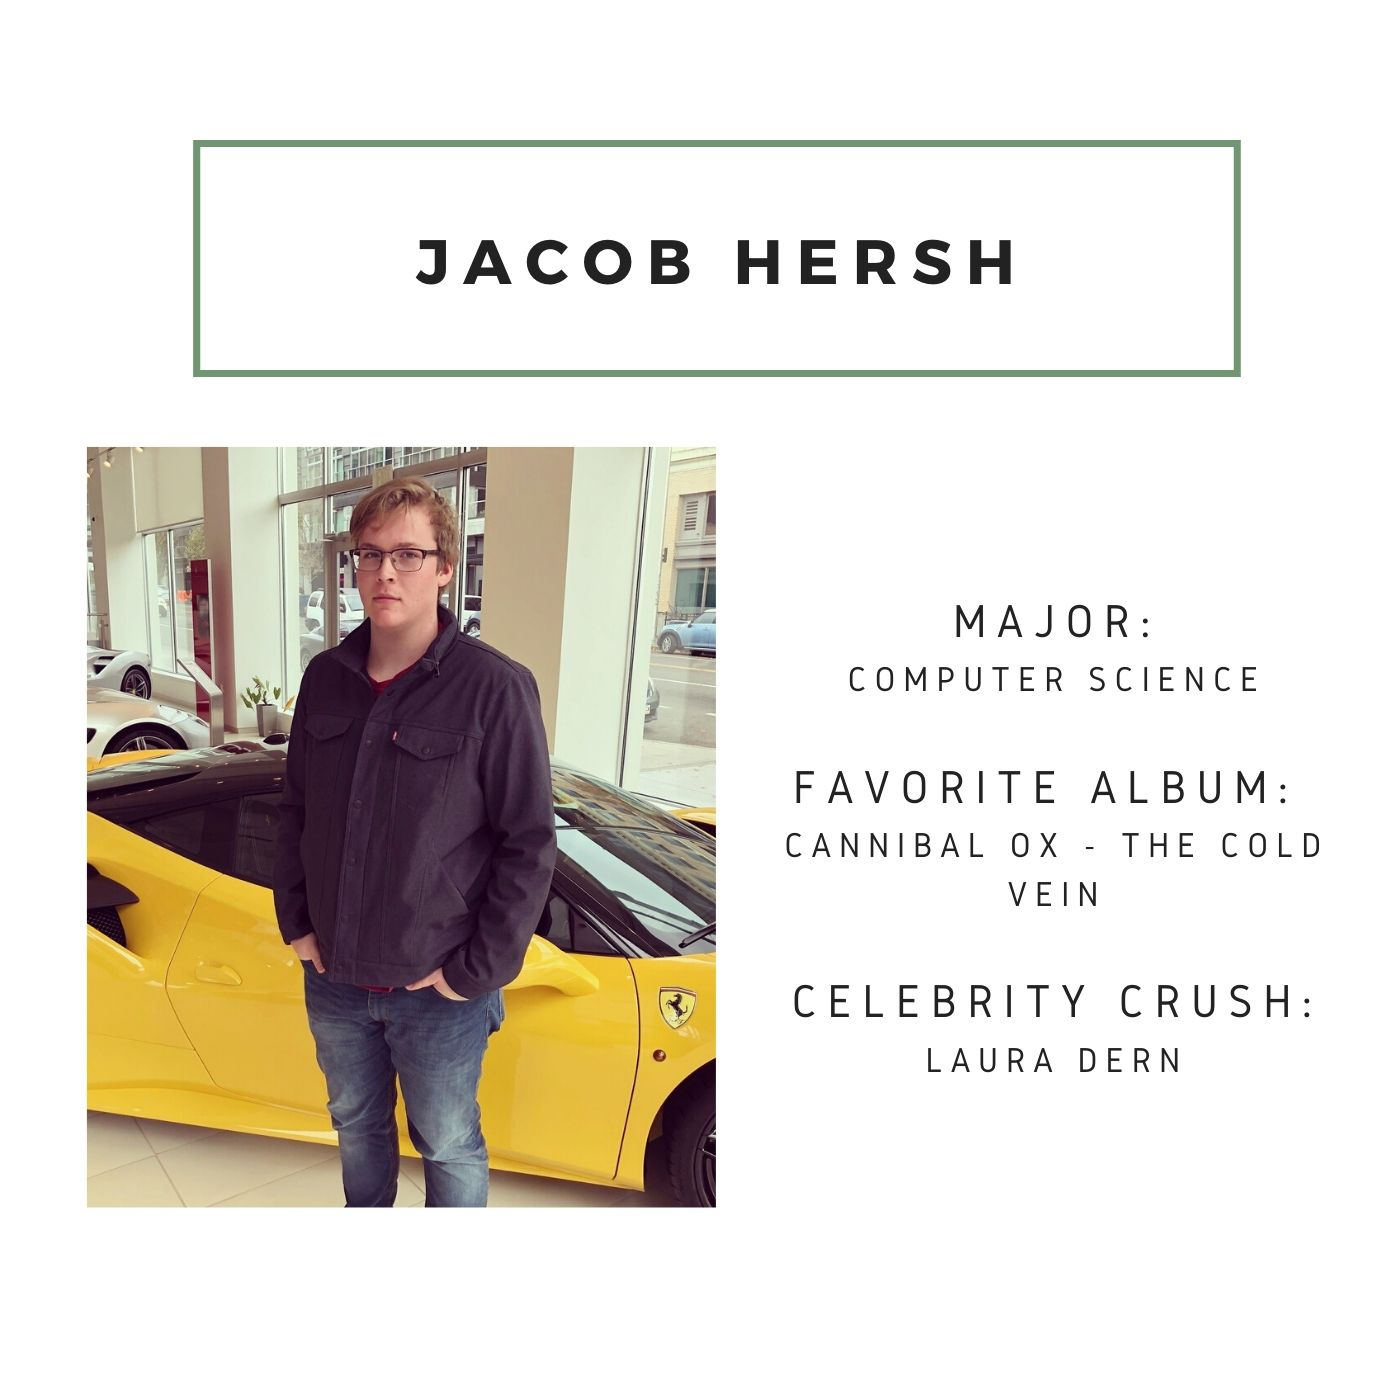 Jacob Hersh